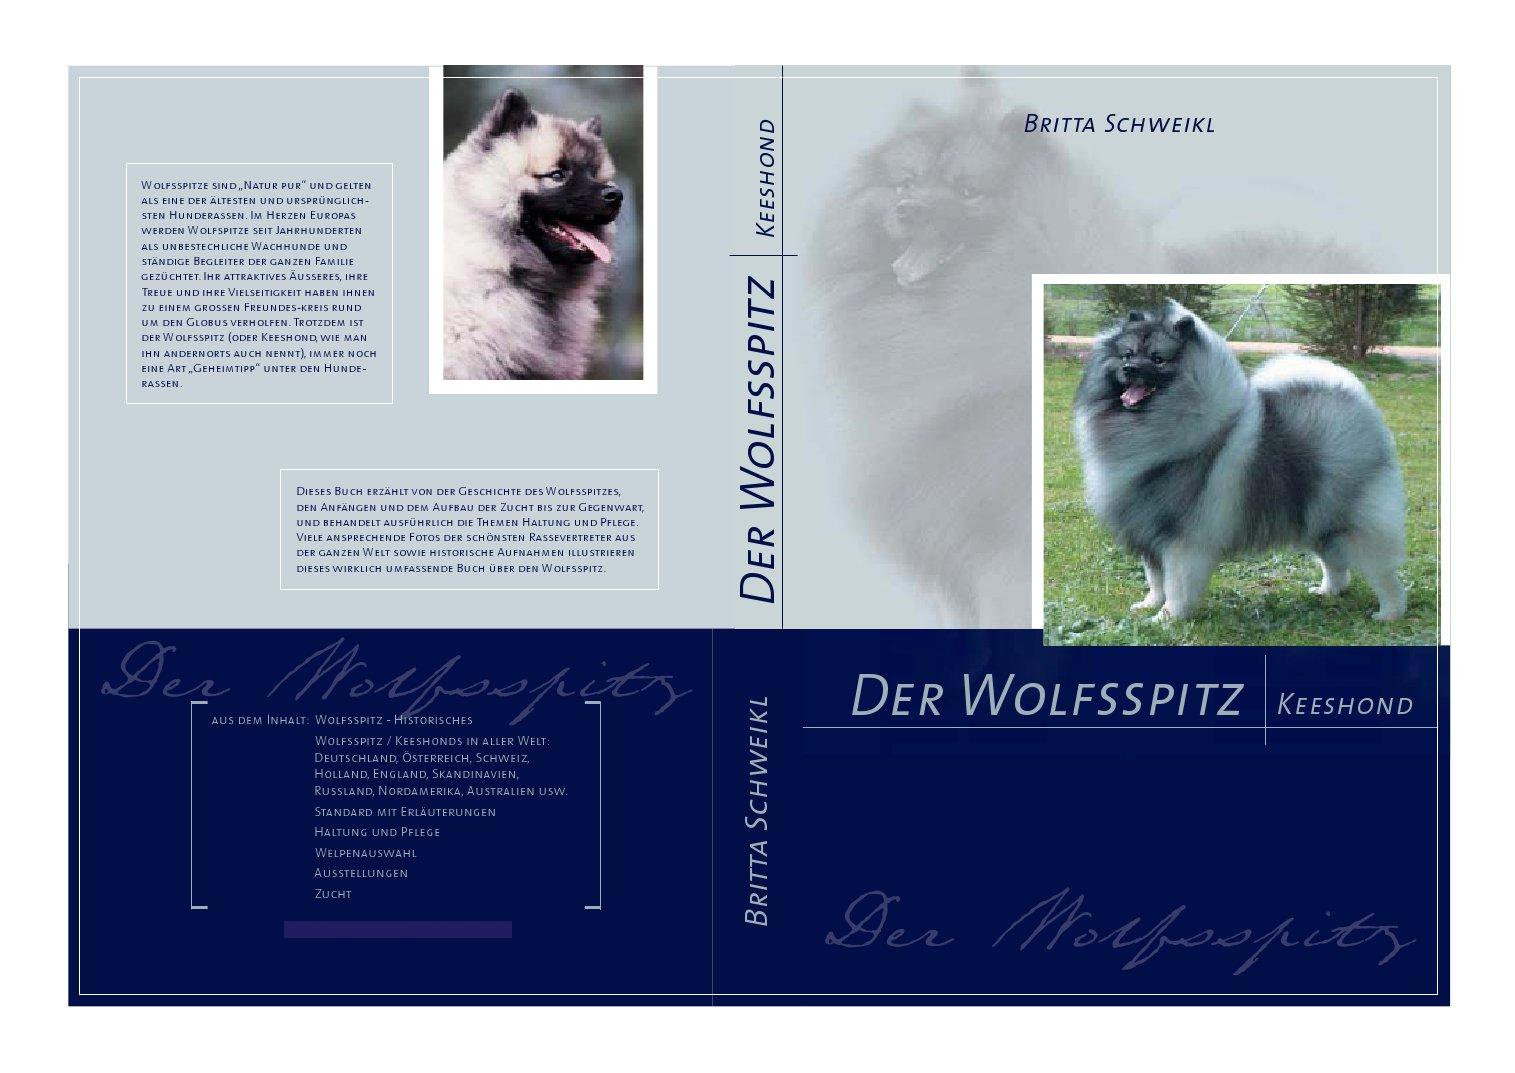 http://www.tierstempel.de/Buchseiten/Wolfsspitzbuch.html